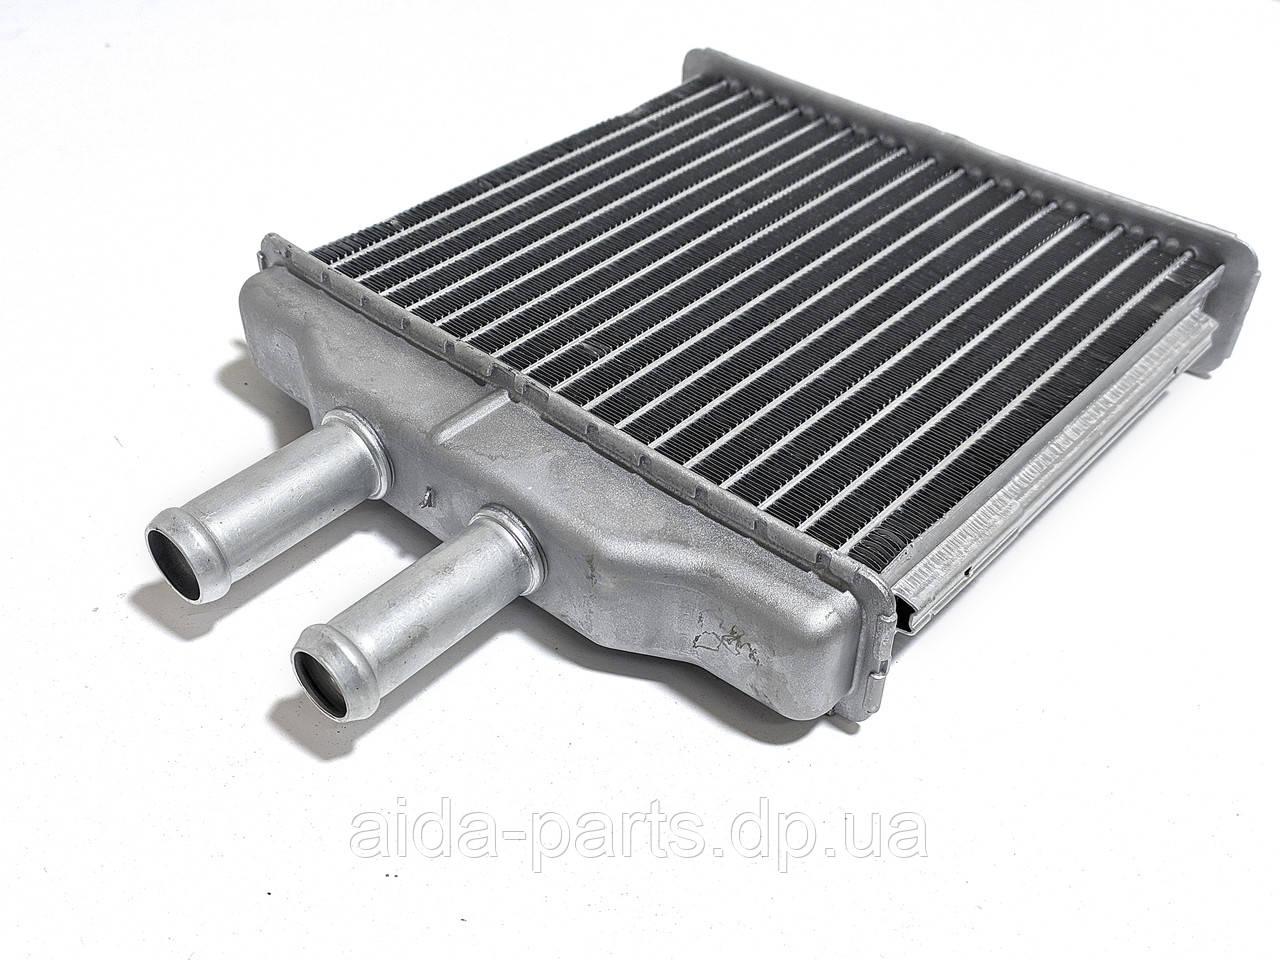 Радиатор печки Lacetti Лачетти алюминиевый SHIKOO 96554446